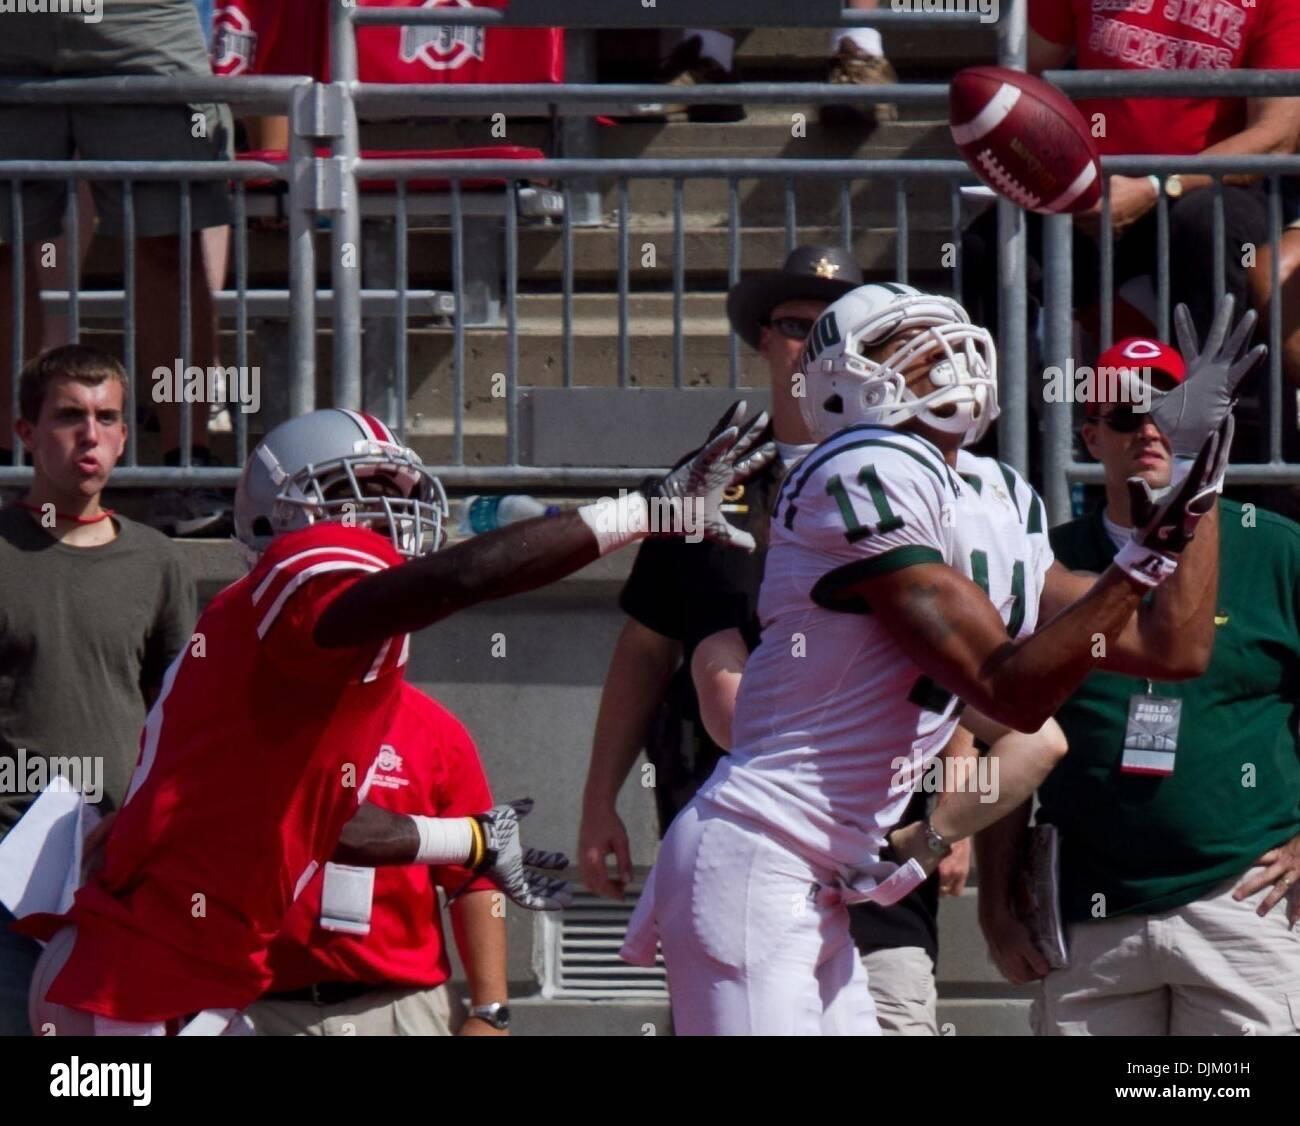 Sept 18, 2010 - Columbus, Ohio, U.S. - OSU Buckeye's destroyed OU 43-7. OU's TERRENCE MCCRAE catches a touchdown Stock Photo